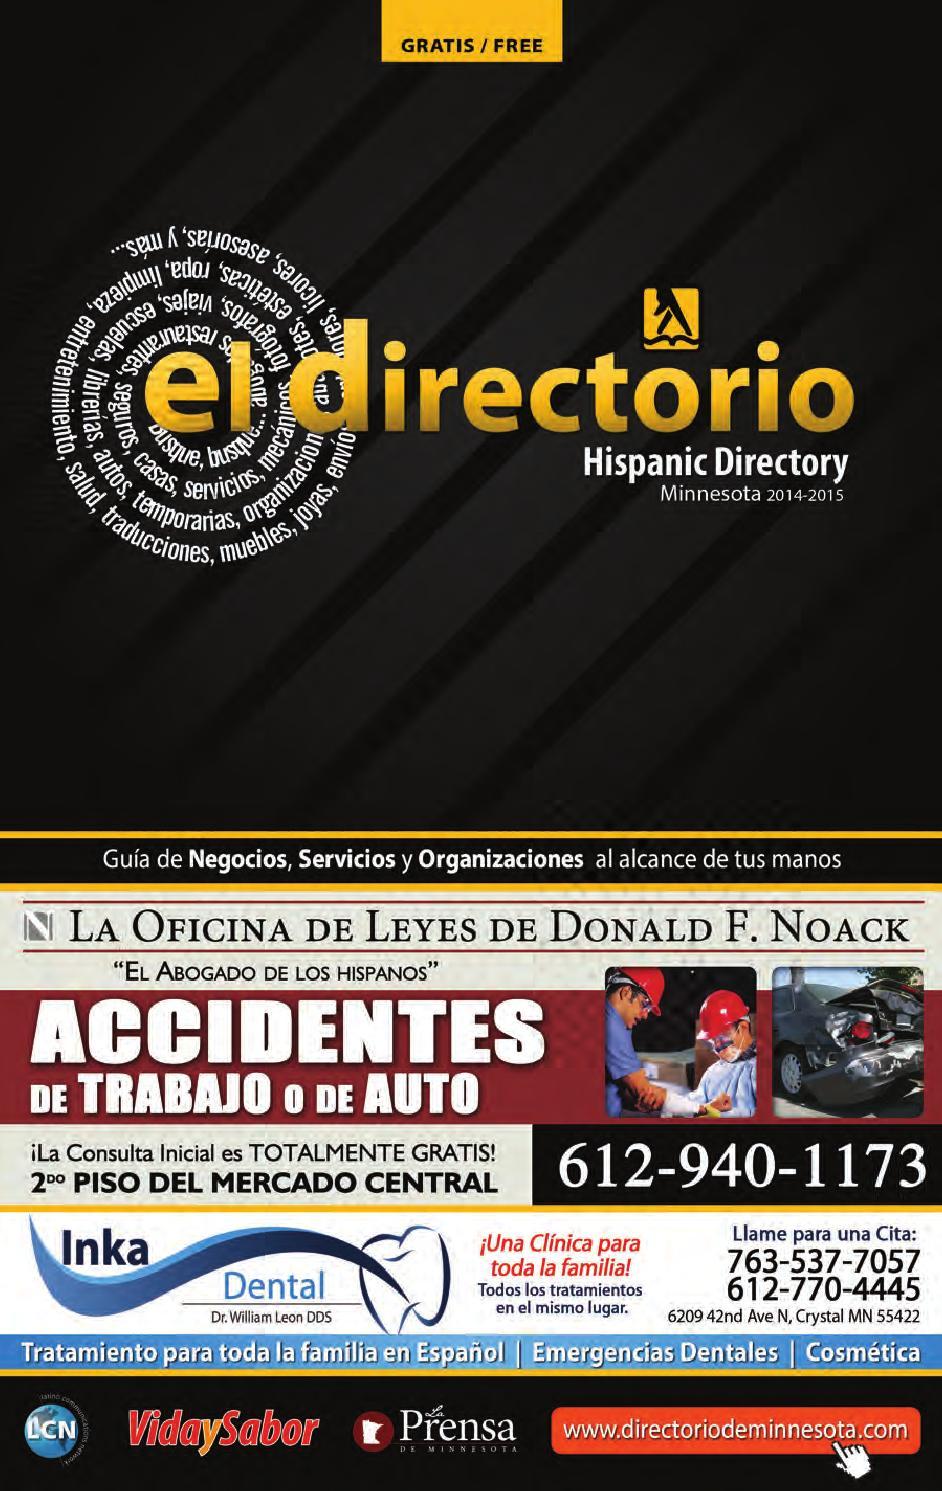 El Directorio MHD - 2014 2015 by Latino Communications Network LLC ...